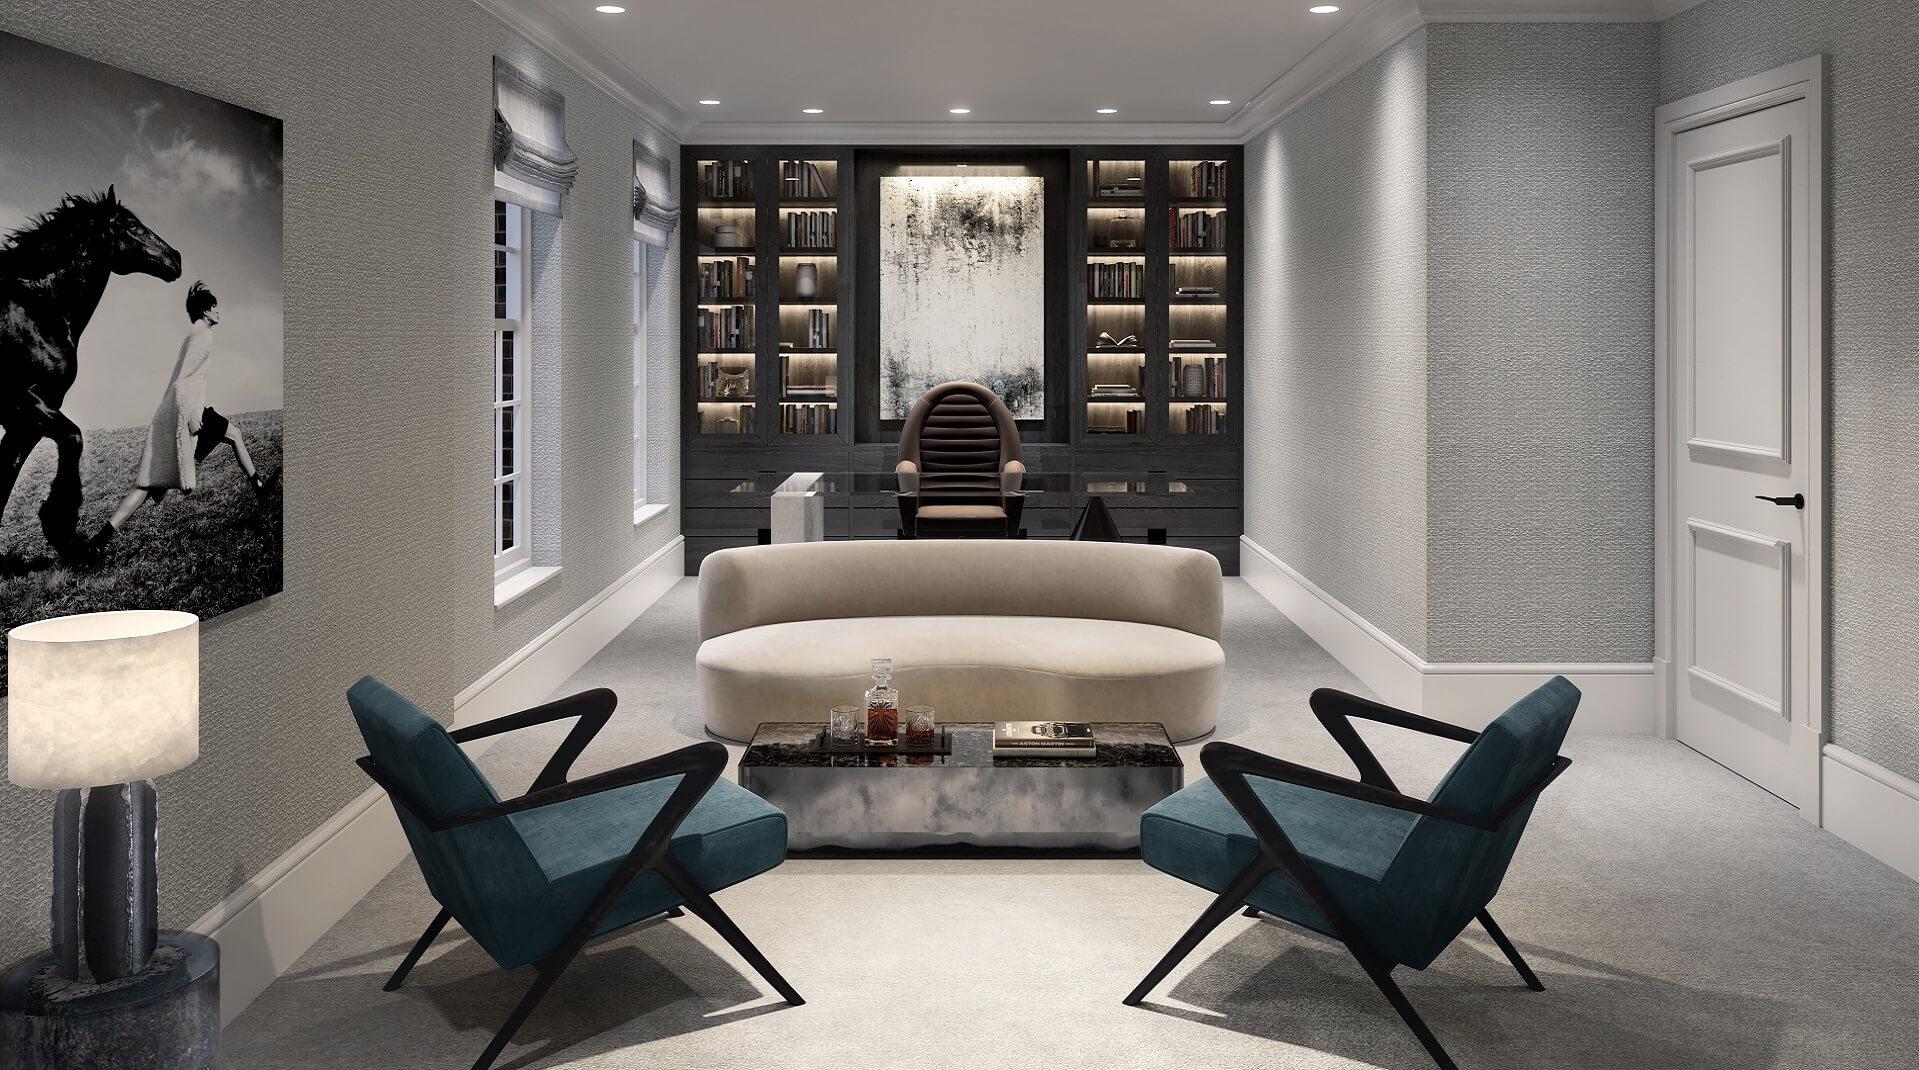 Sanders Studios_Fusion_The Radlett_Study Interior CGI web